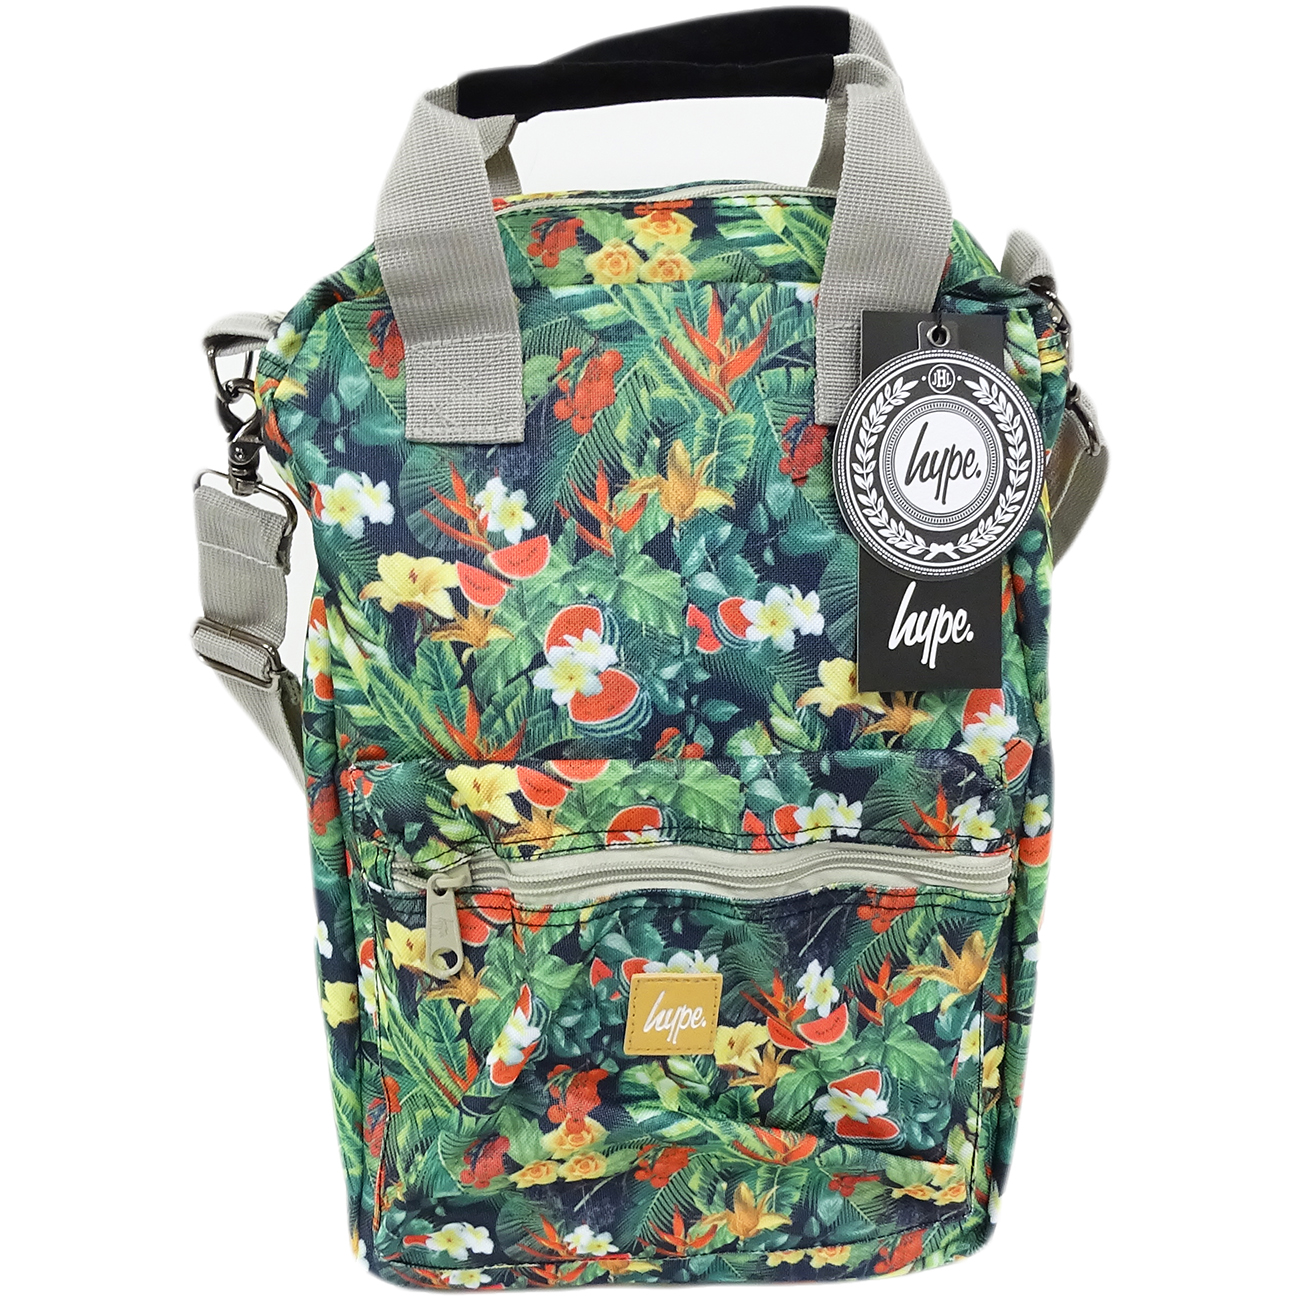 Hype Handle Bag - Paradise